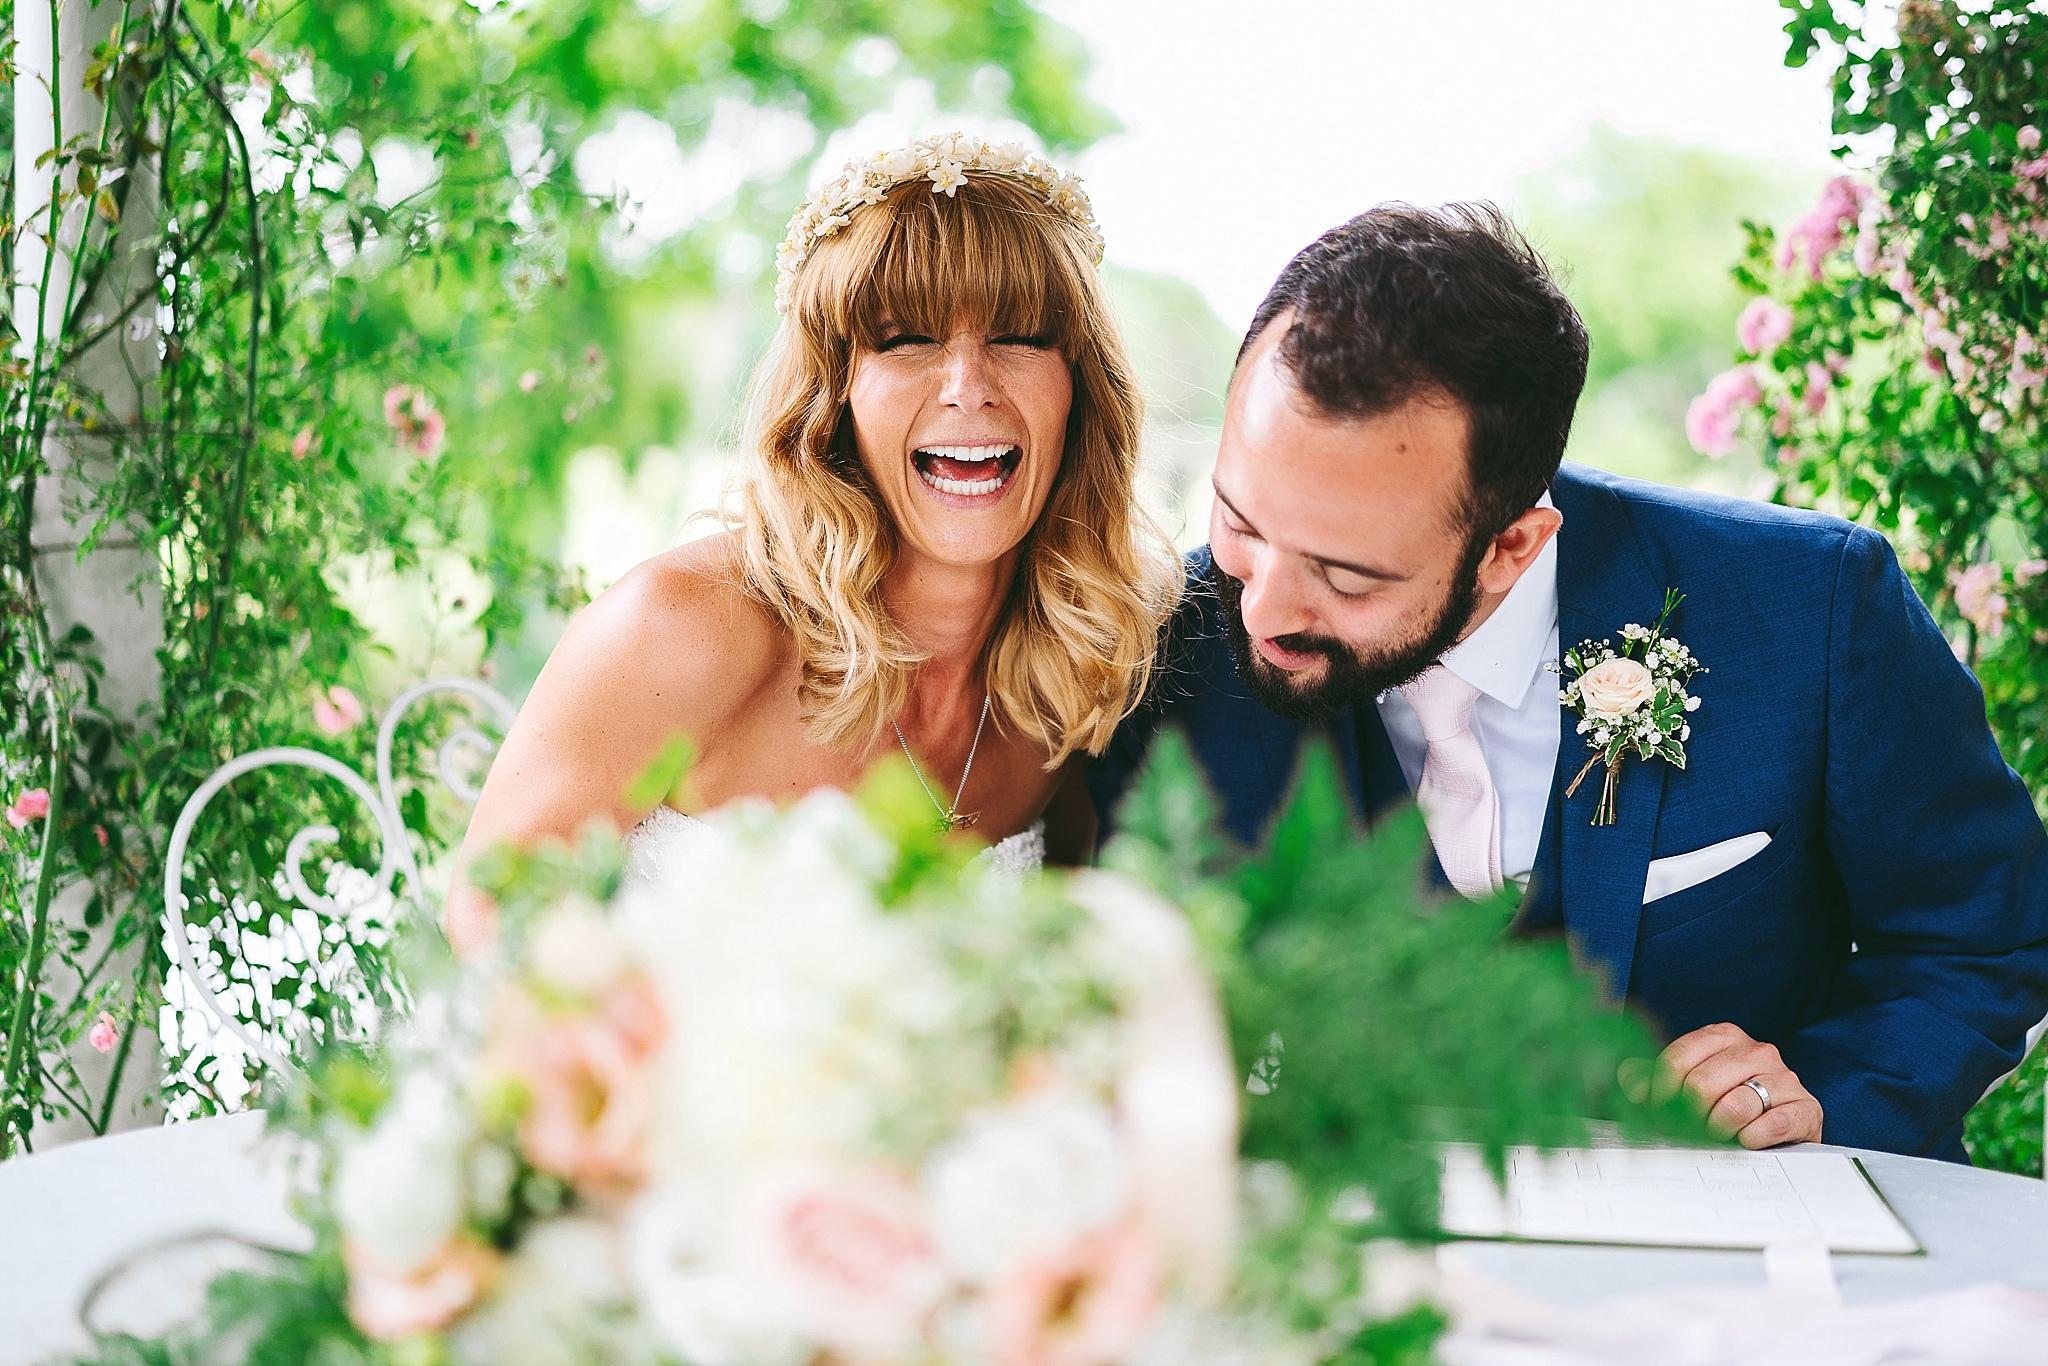 aga-tomaszek-wedding-photographer-cardiff-2016_1020